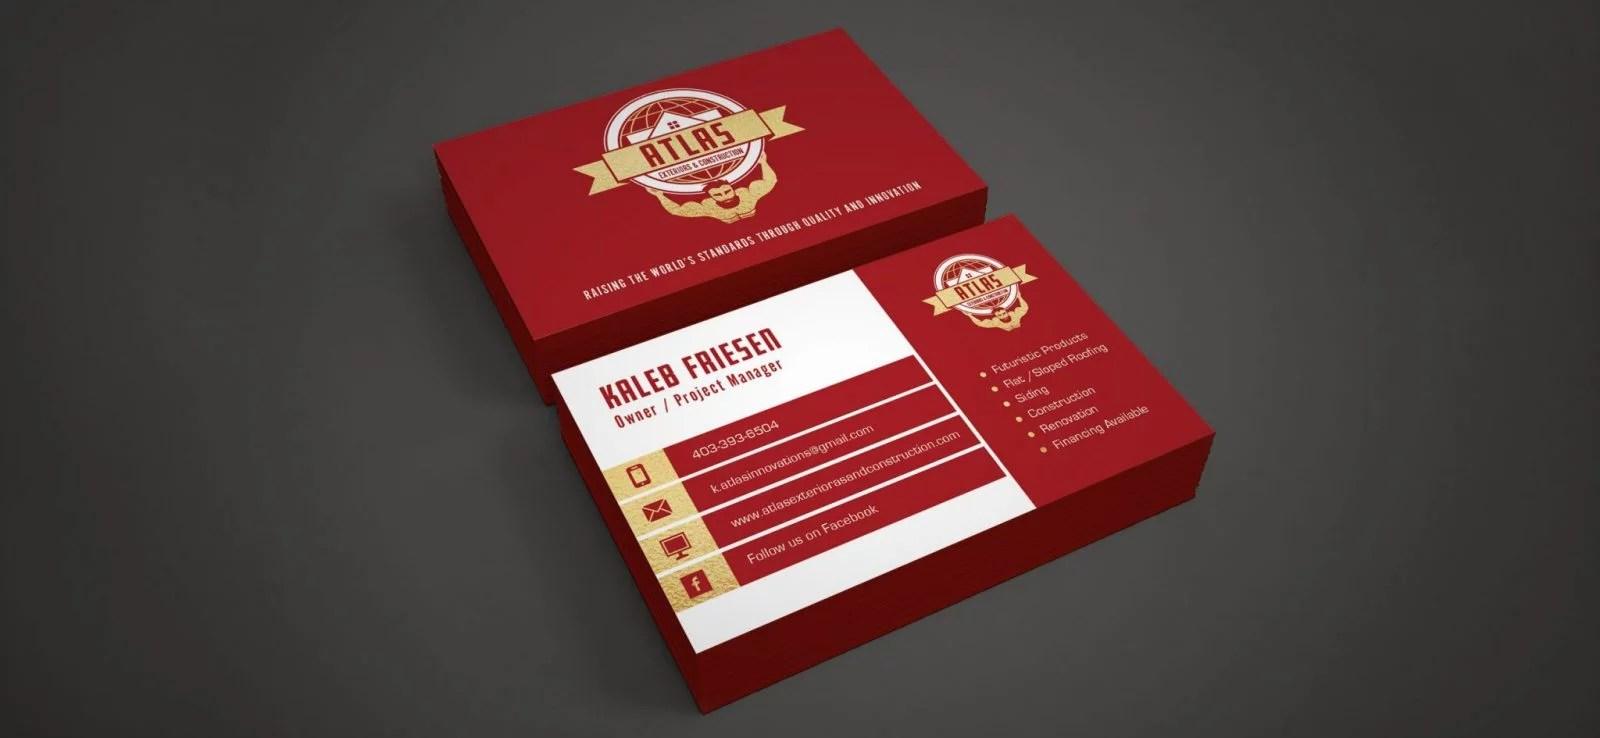 Atlas Exteriors - Business Card Design - Lethbridge Alberta